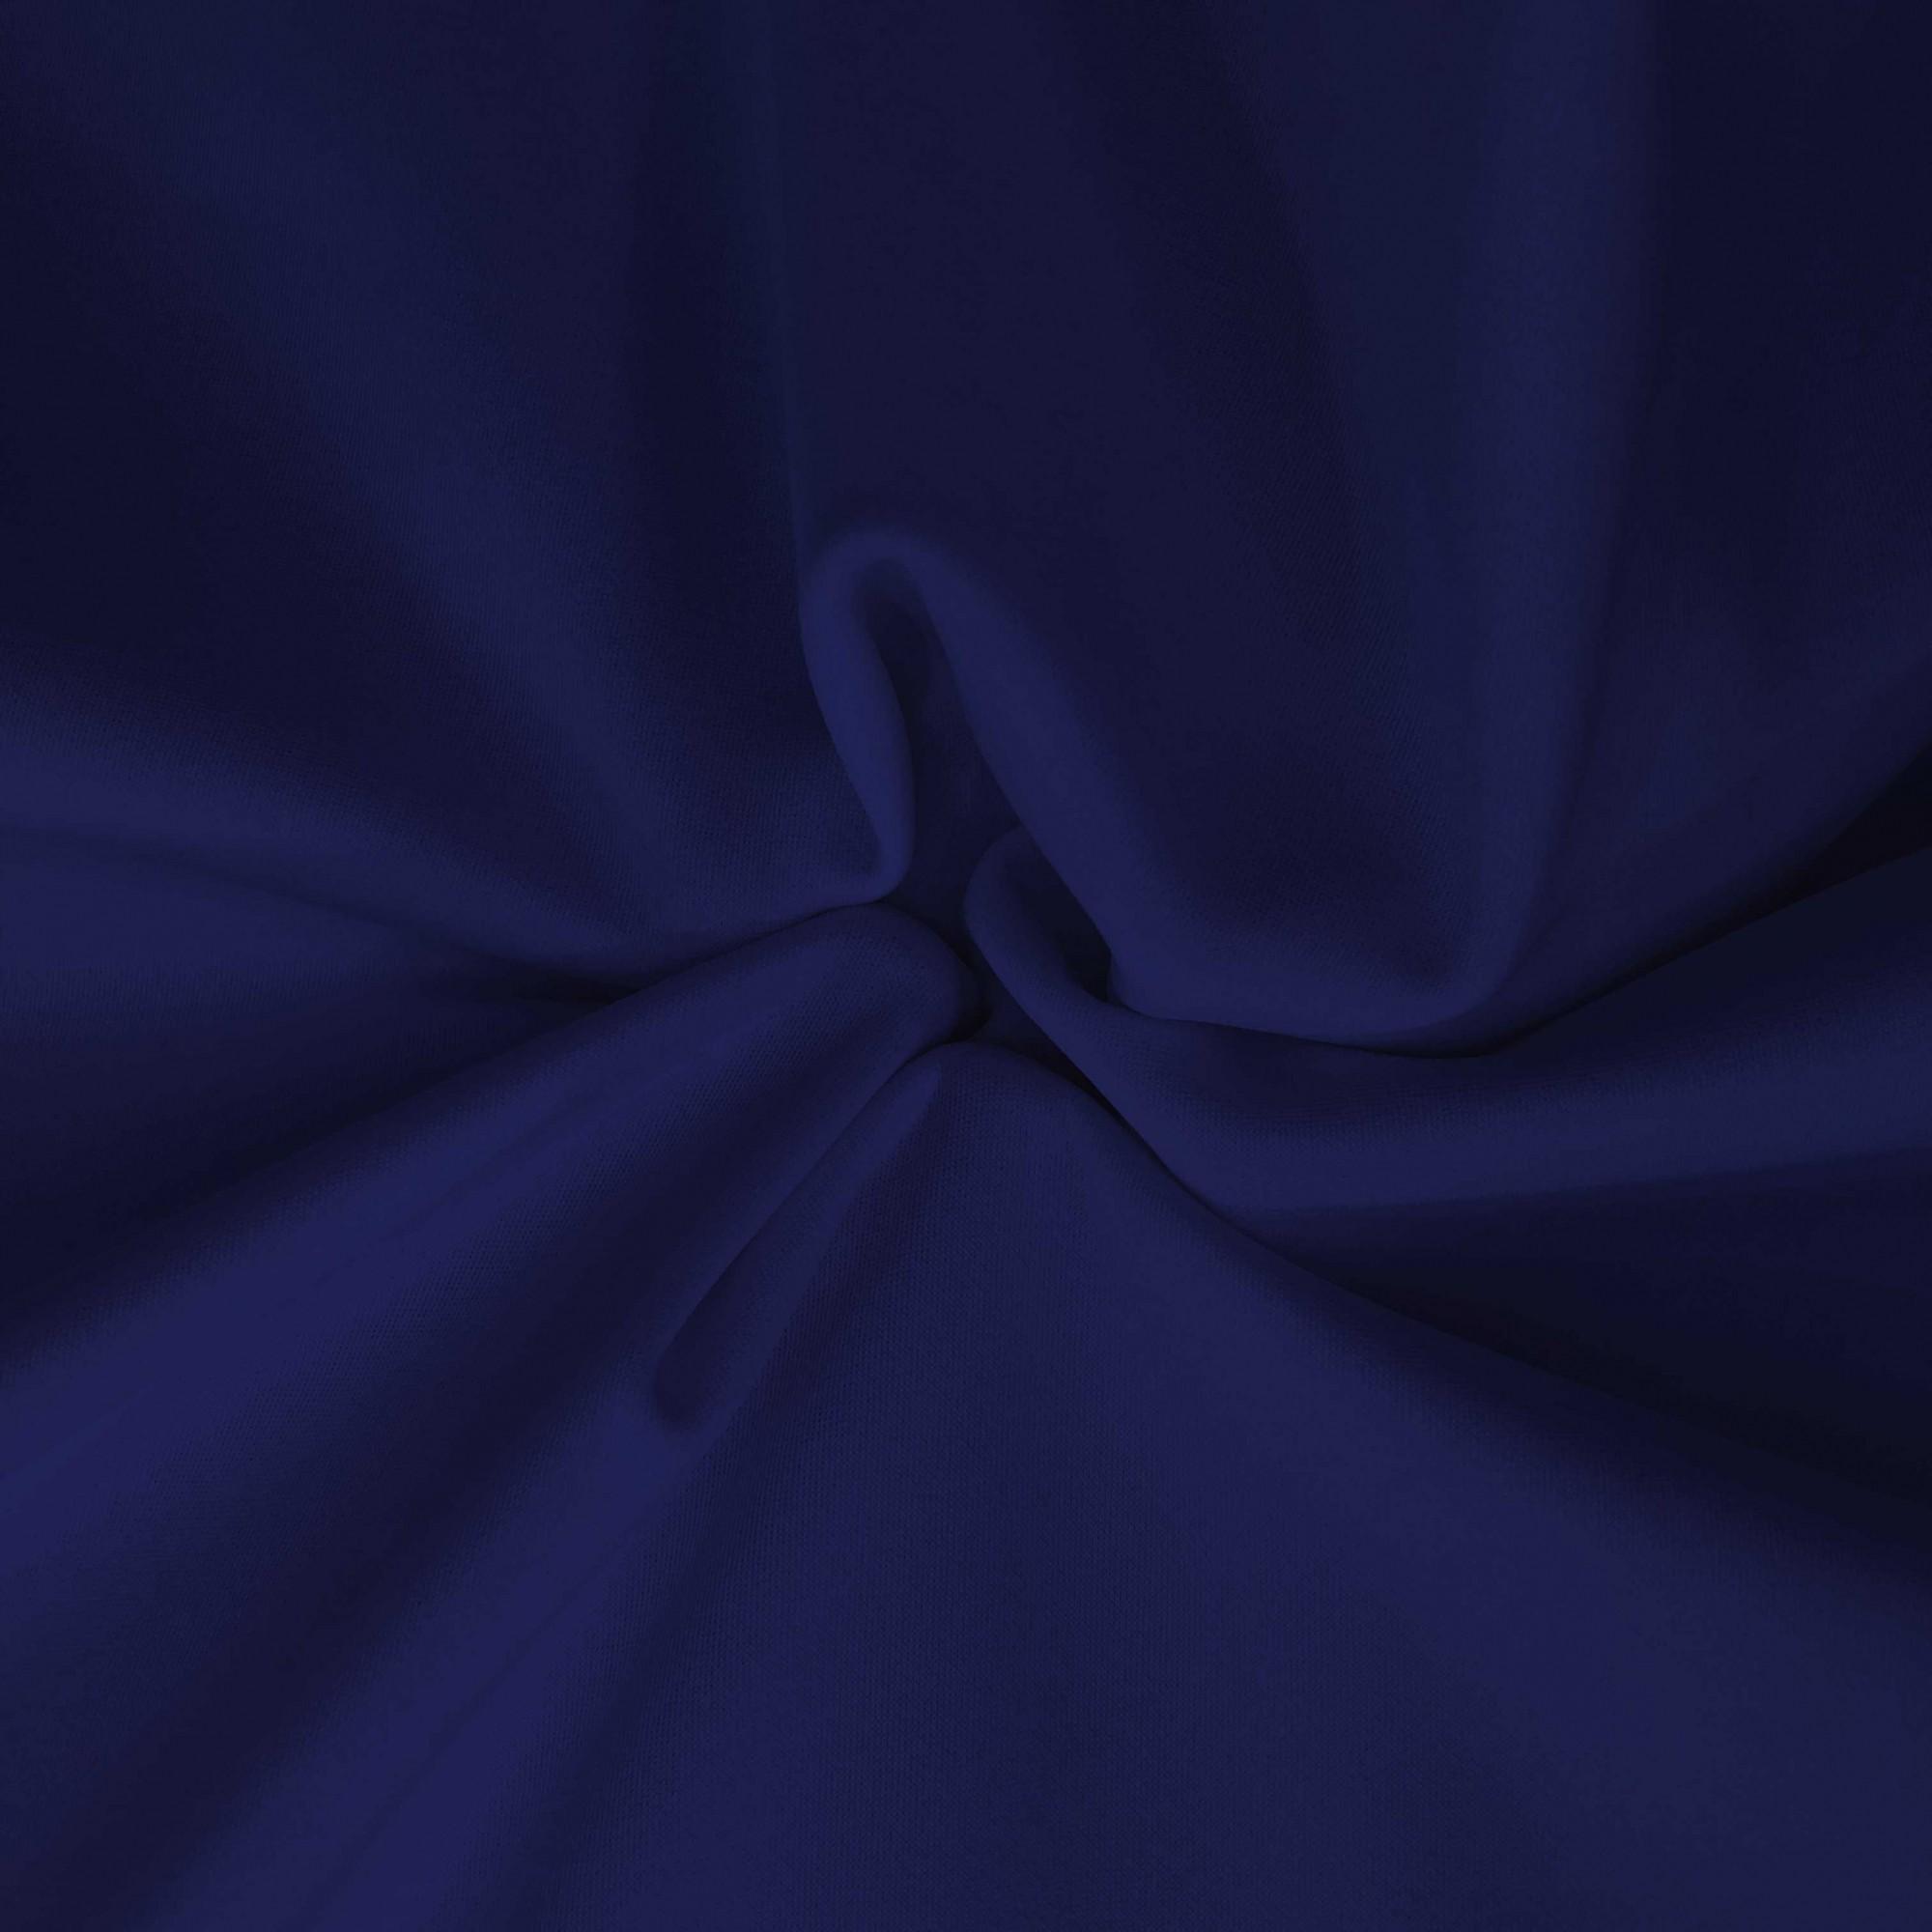 Tecido Malha Neocrepe Liso 97%Poliéster 3%Elastano Azul Marinho